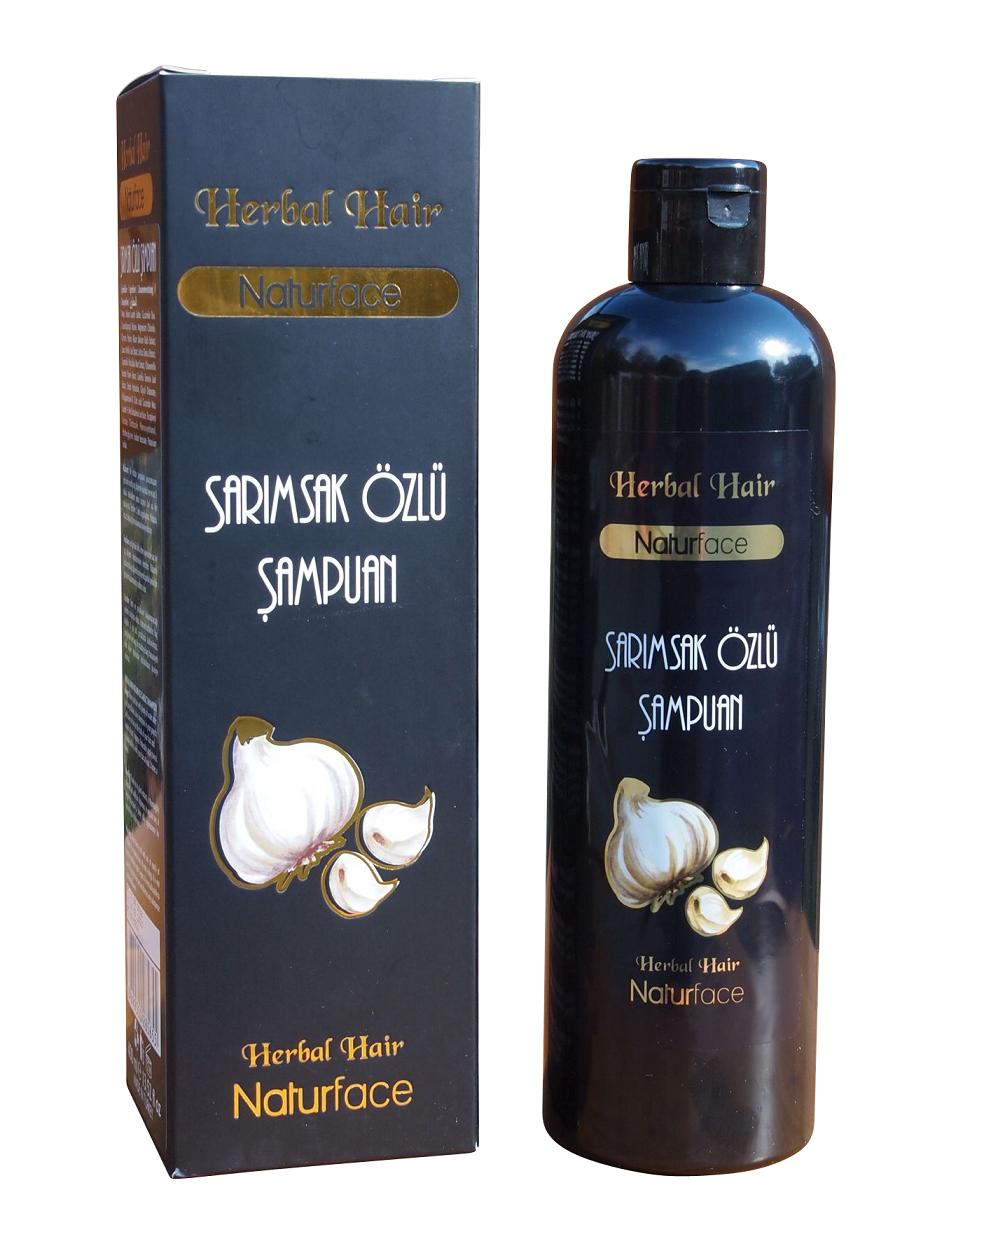 Knoblauch Shampoo Naturface 400 ml gegen Haarausfall Sarimsakli Sampuan